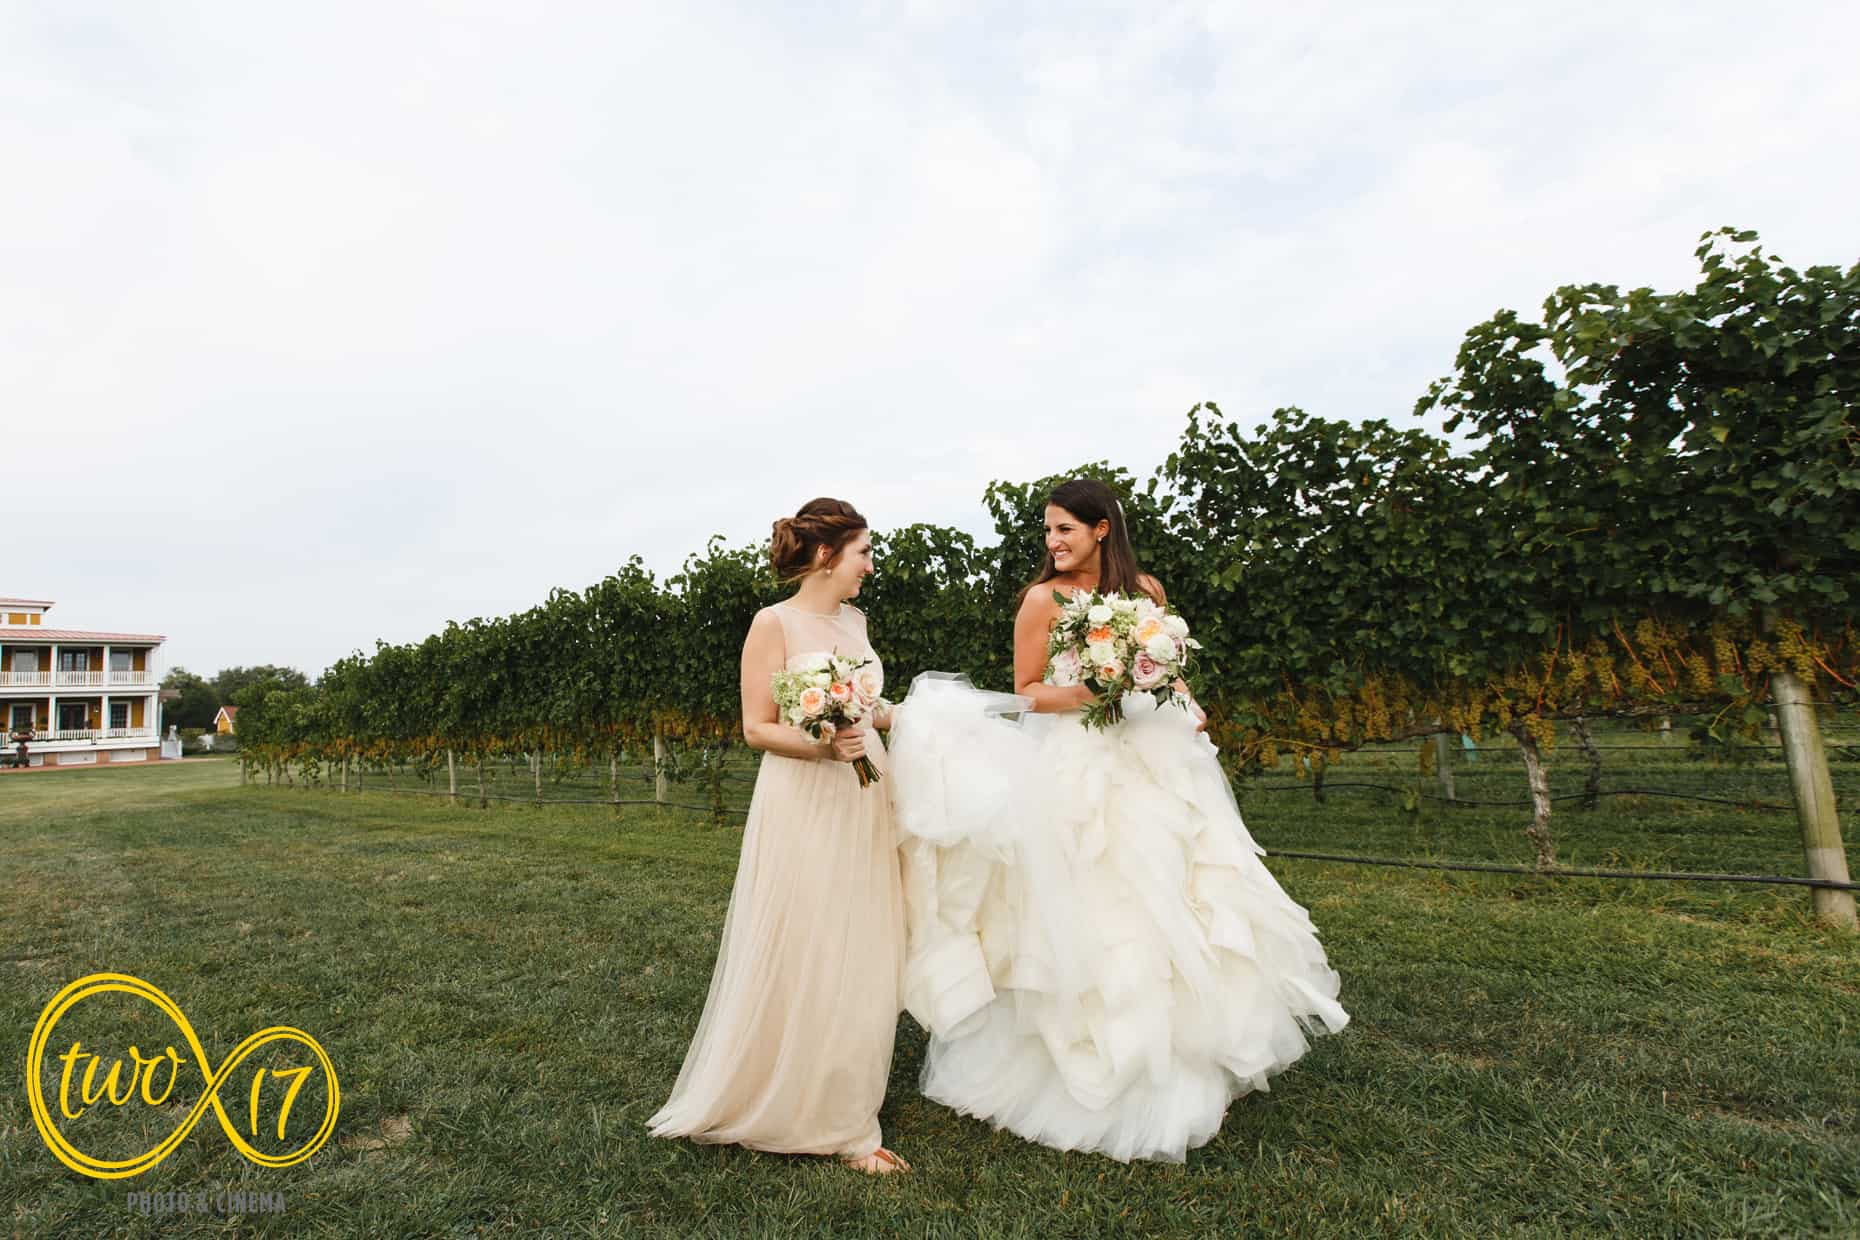 Candid New Jersey Wedding Photos